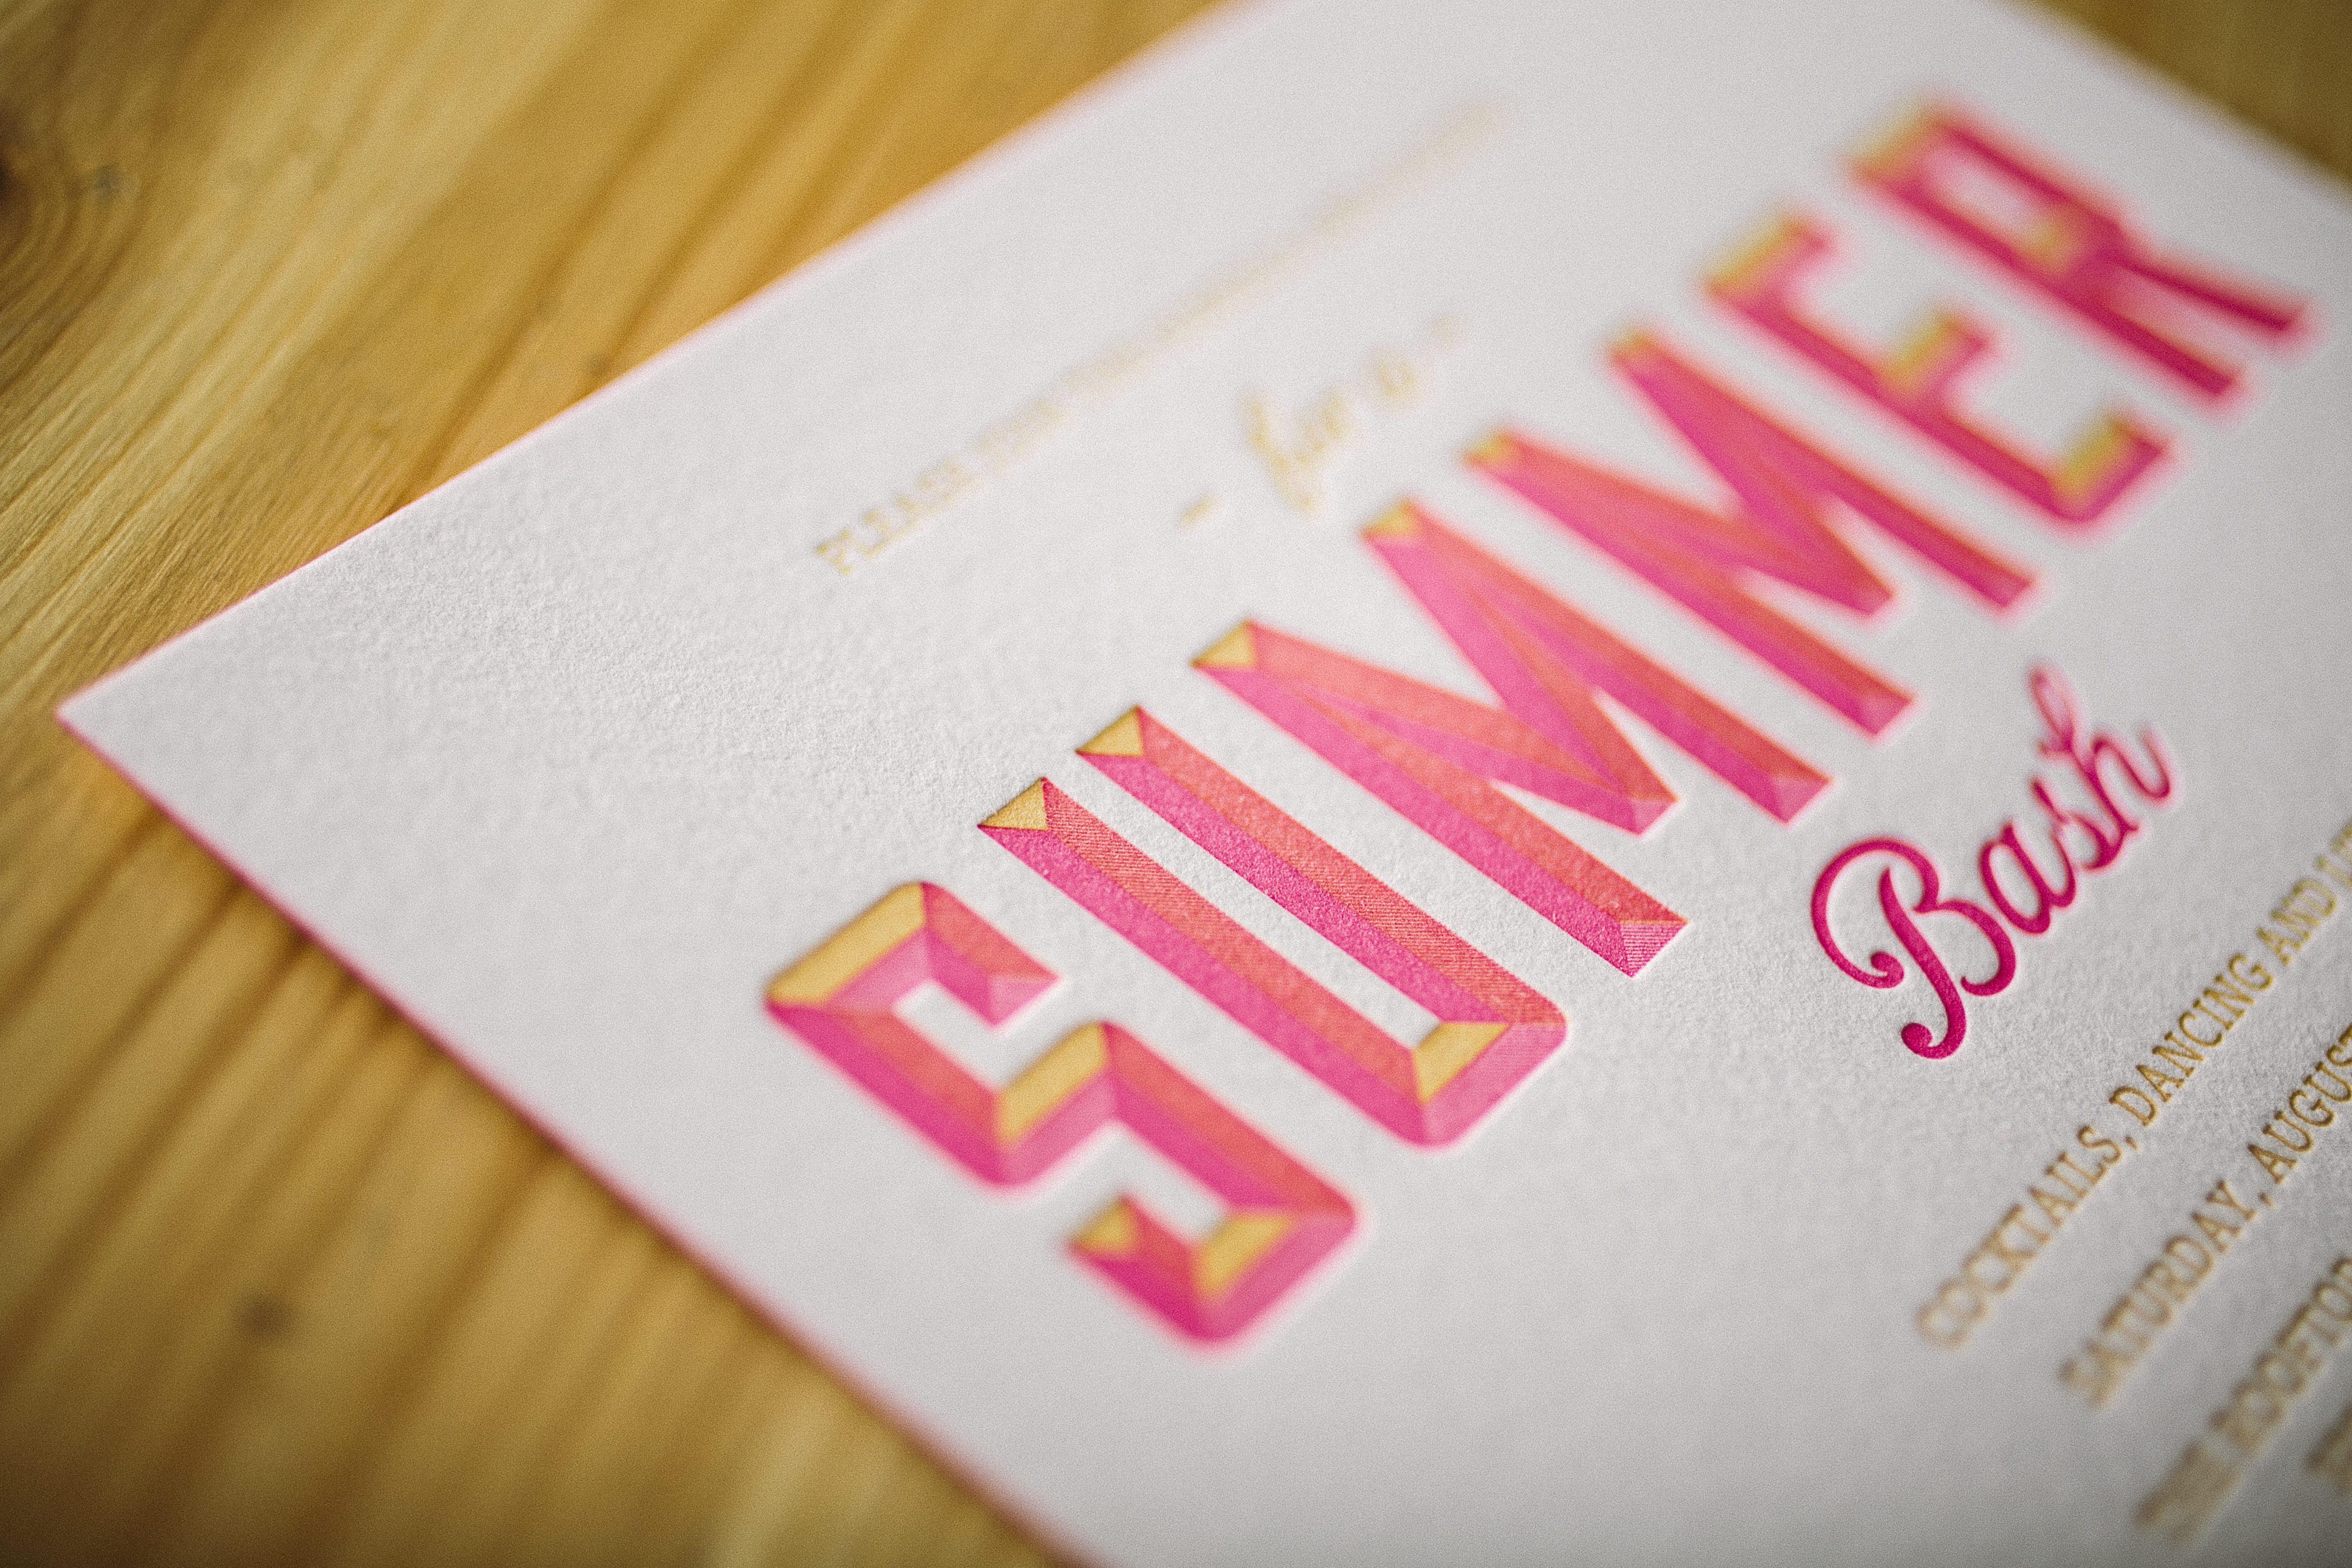 letterpress party invitations for summertime bash - Bella Figura